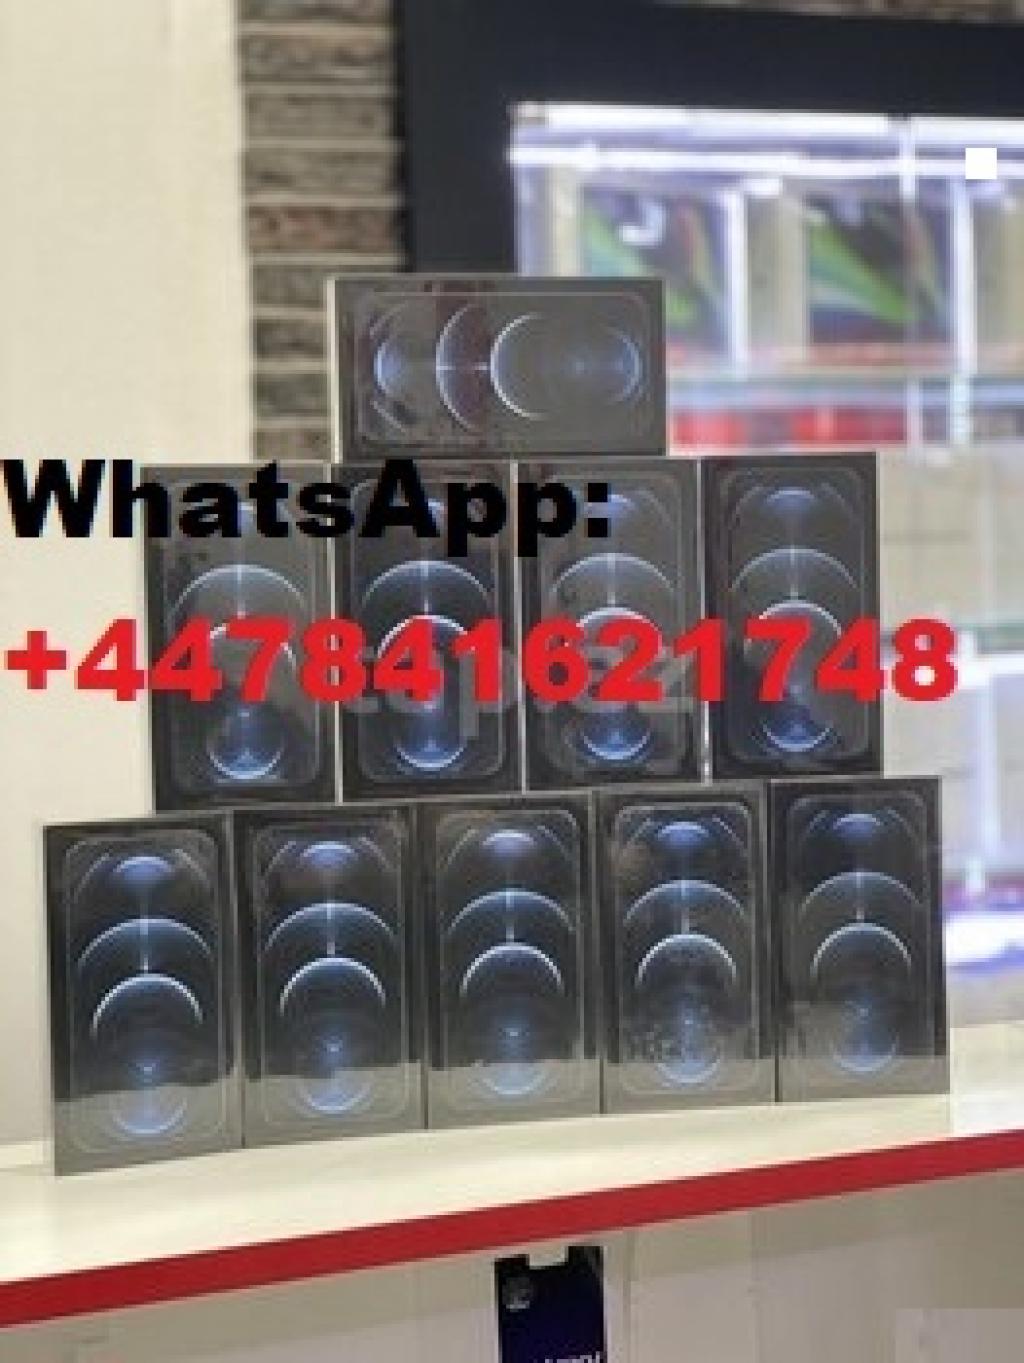 Apple iPhone 12 Pro Max, iPhone 12 Pro Whatsap +44